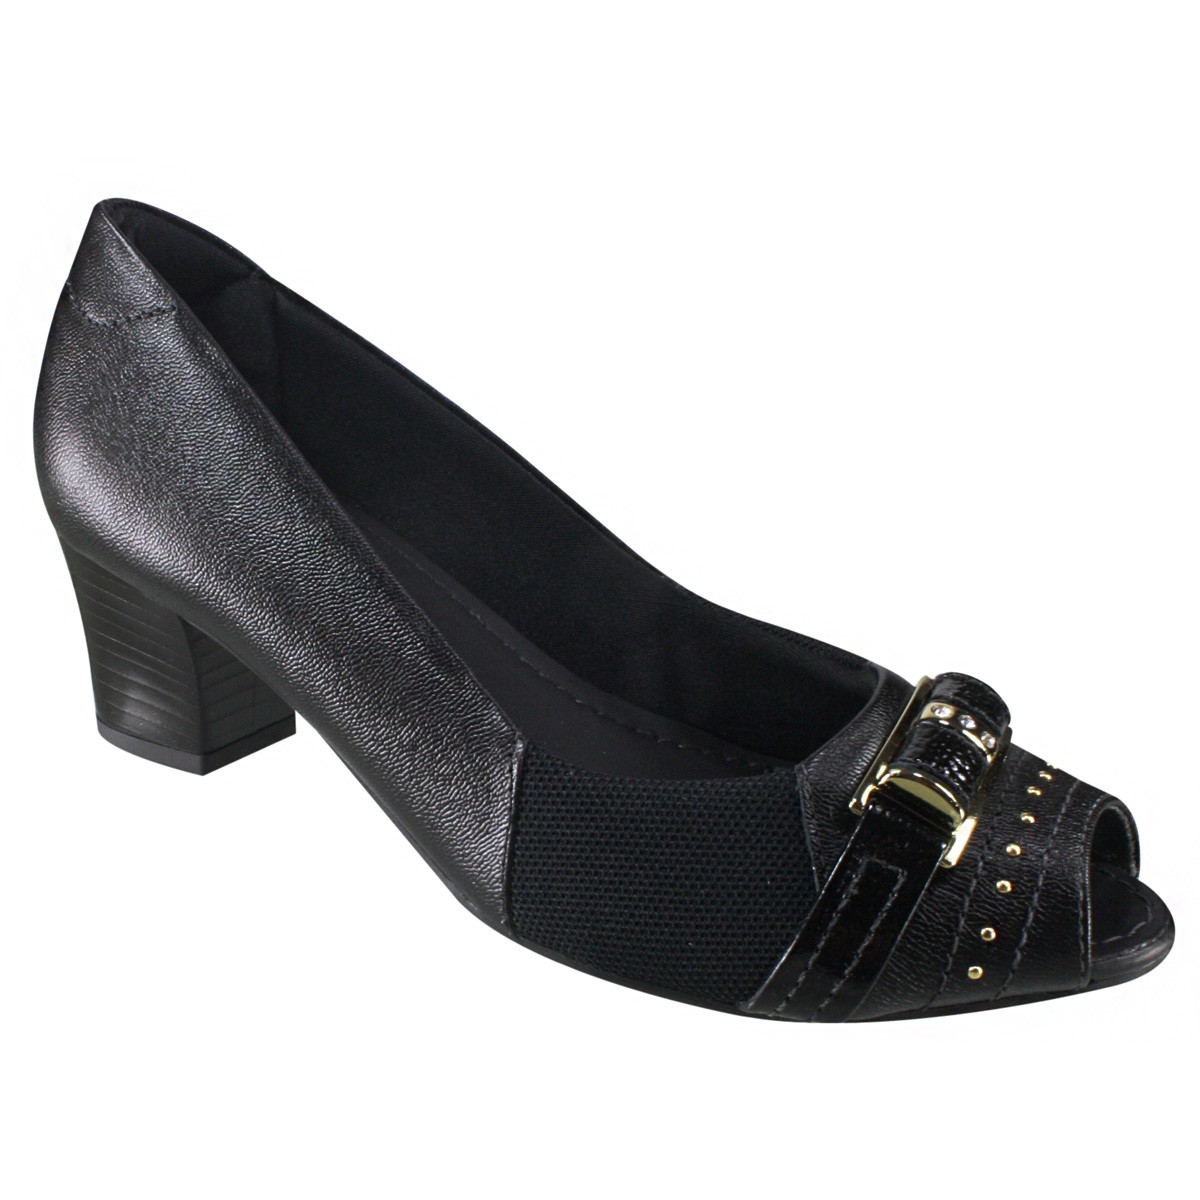 d27fce046e Sapatos - Usaflex - Feminino - Modelo  Peep Toe (Bico Aberto)